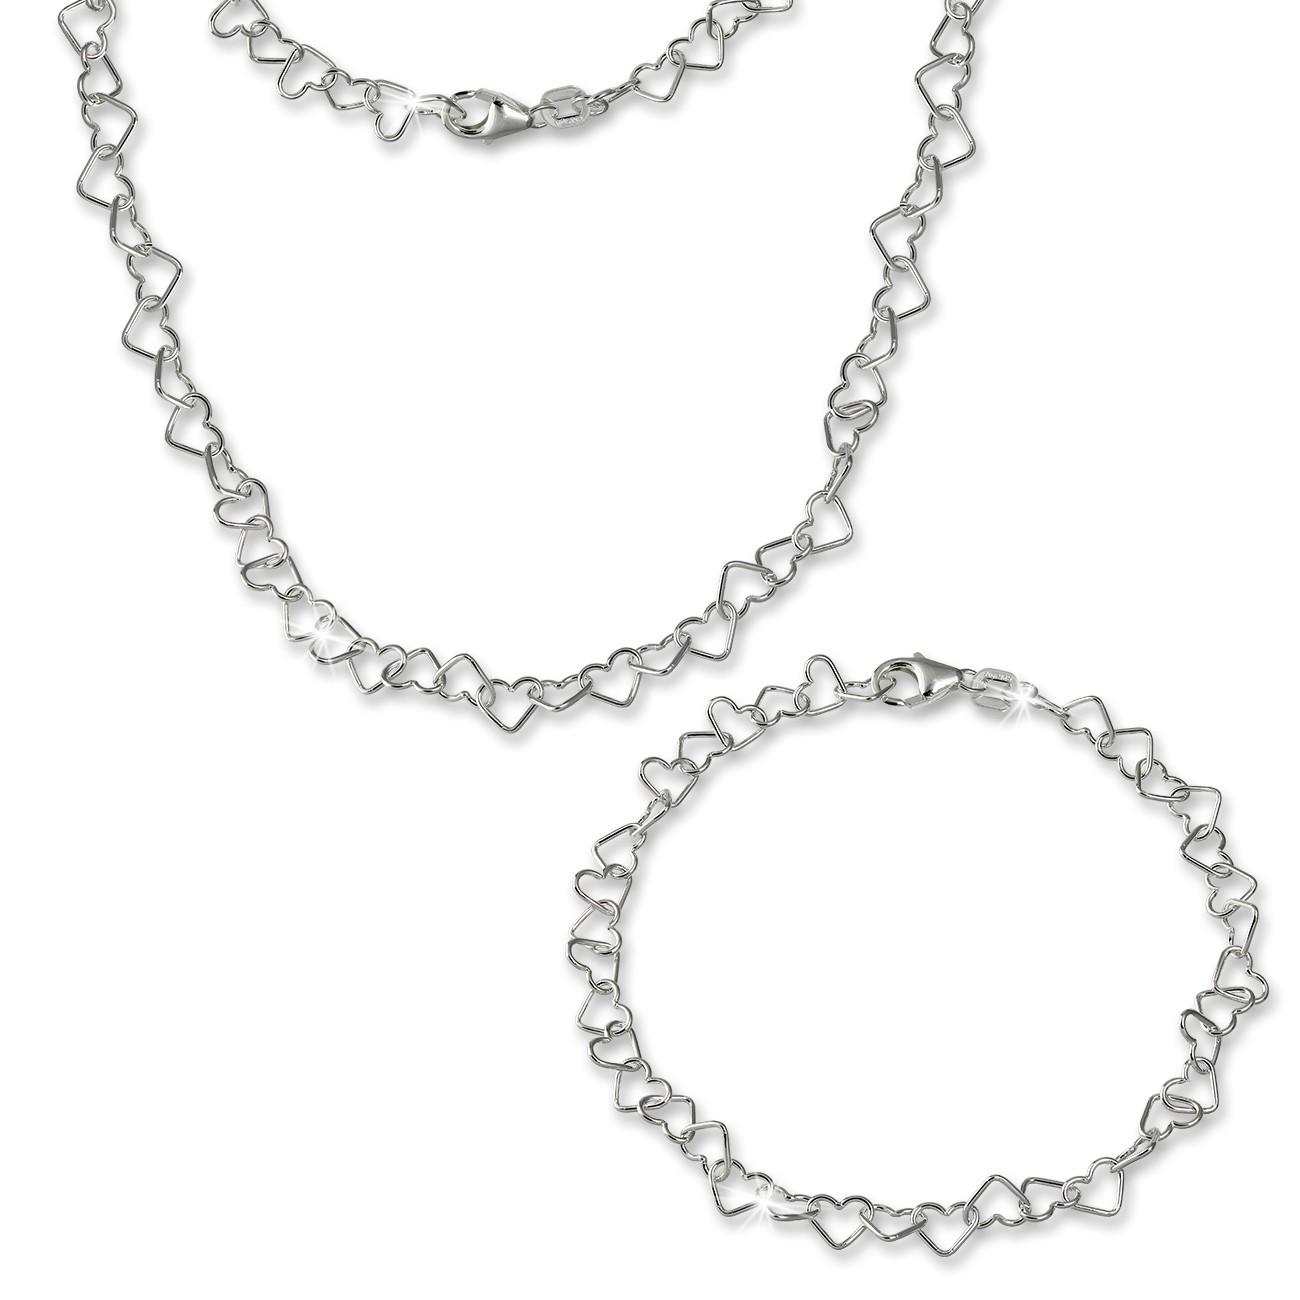 SilberDream Schmuckset Herz Kette & Armband 925 Sterling Silber SDS211J